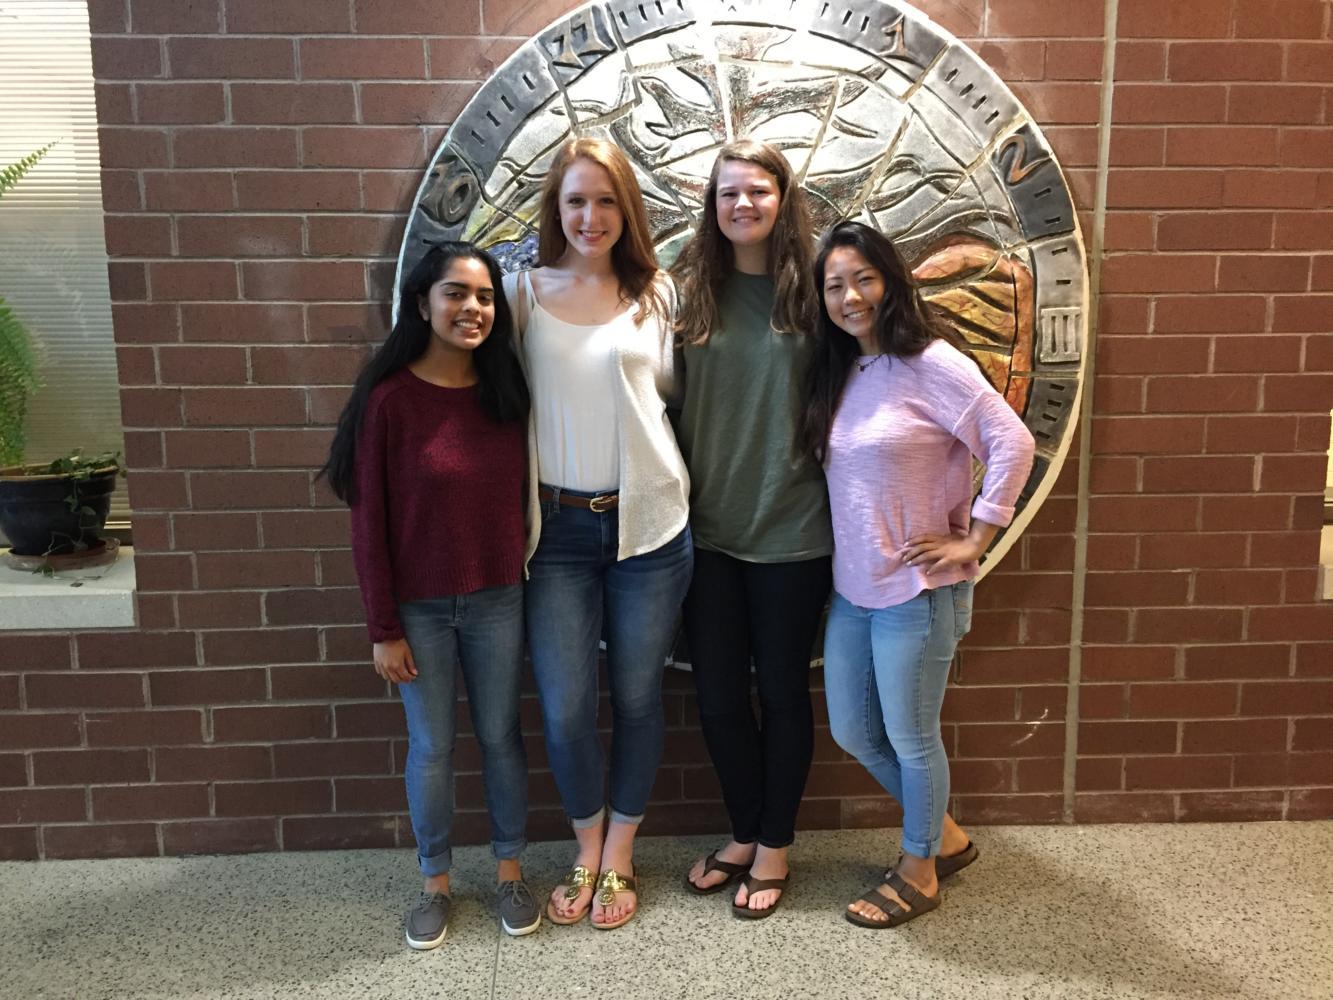 2017 Girls State participants: Joitree Alam, Brooke Bailey, Sarah Harkness, Joy Li